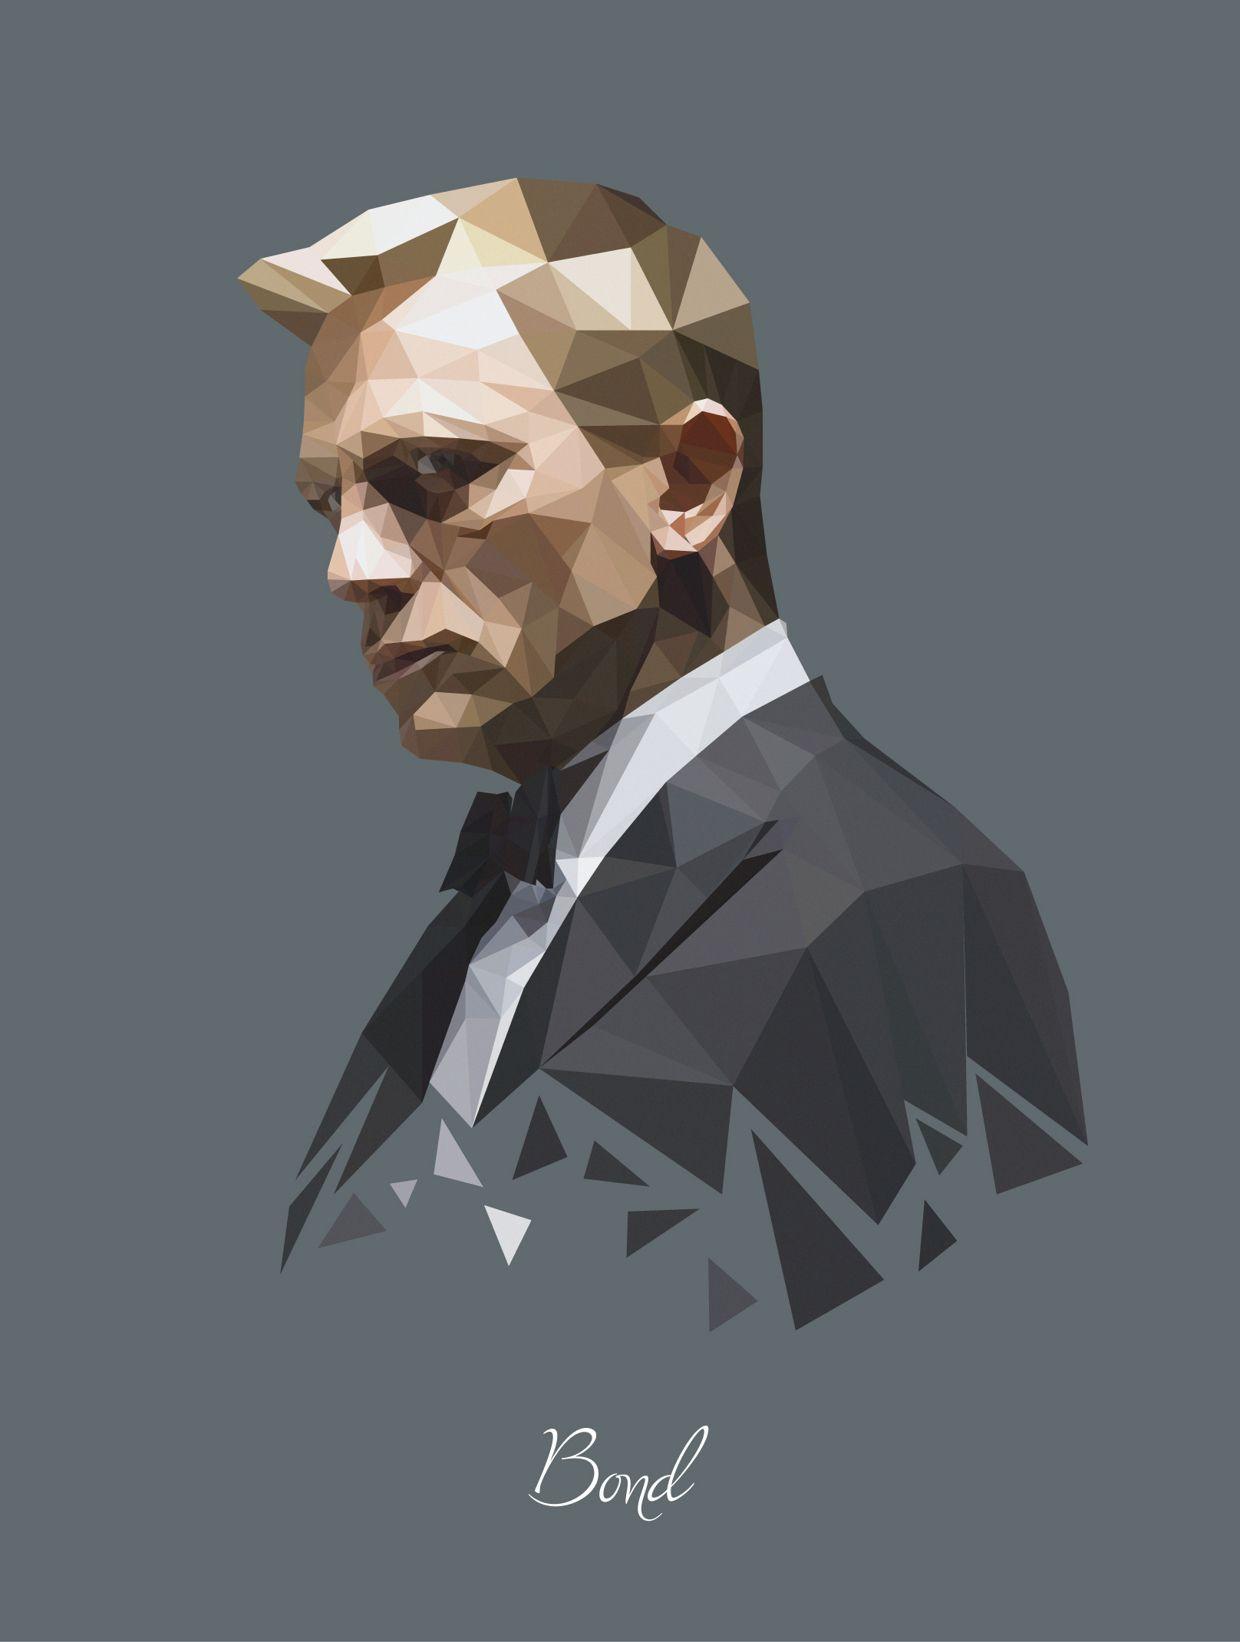 d161af0bd James Bond (Daniel Craig) - Polygon Portrait | ::Illustrations ...